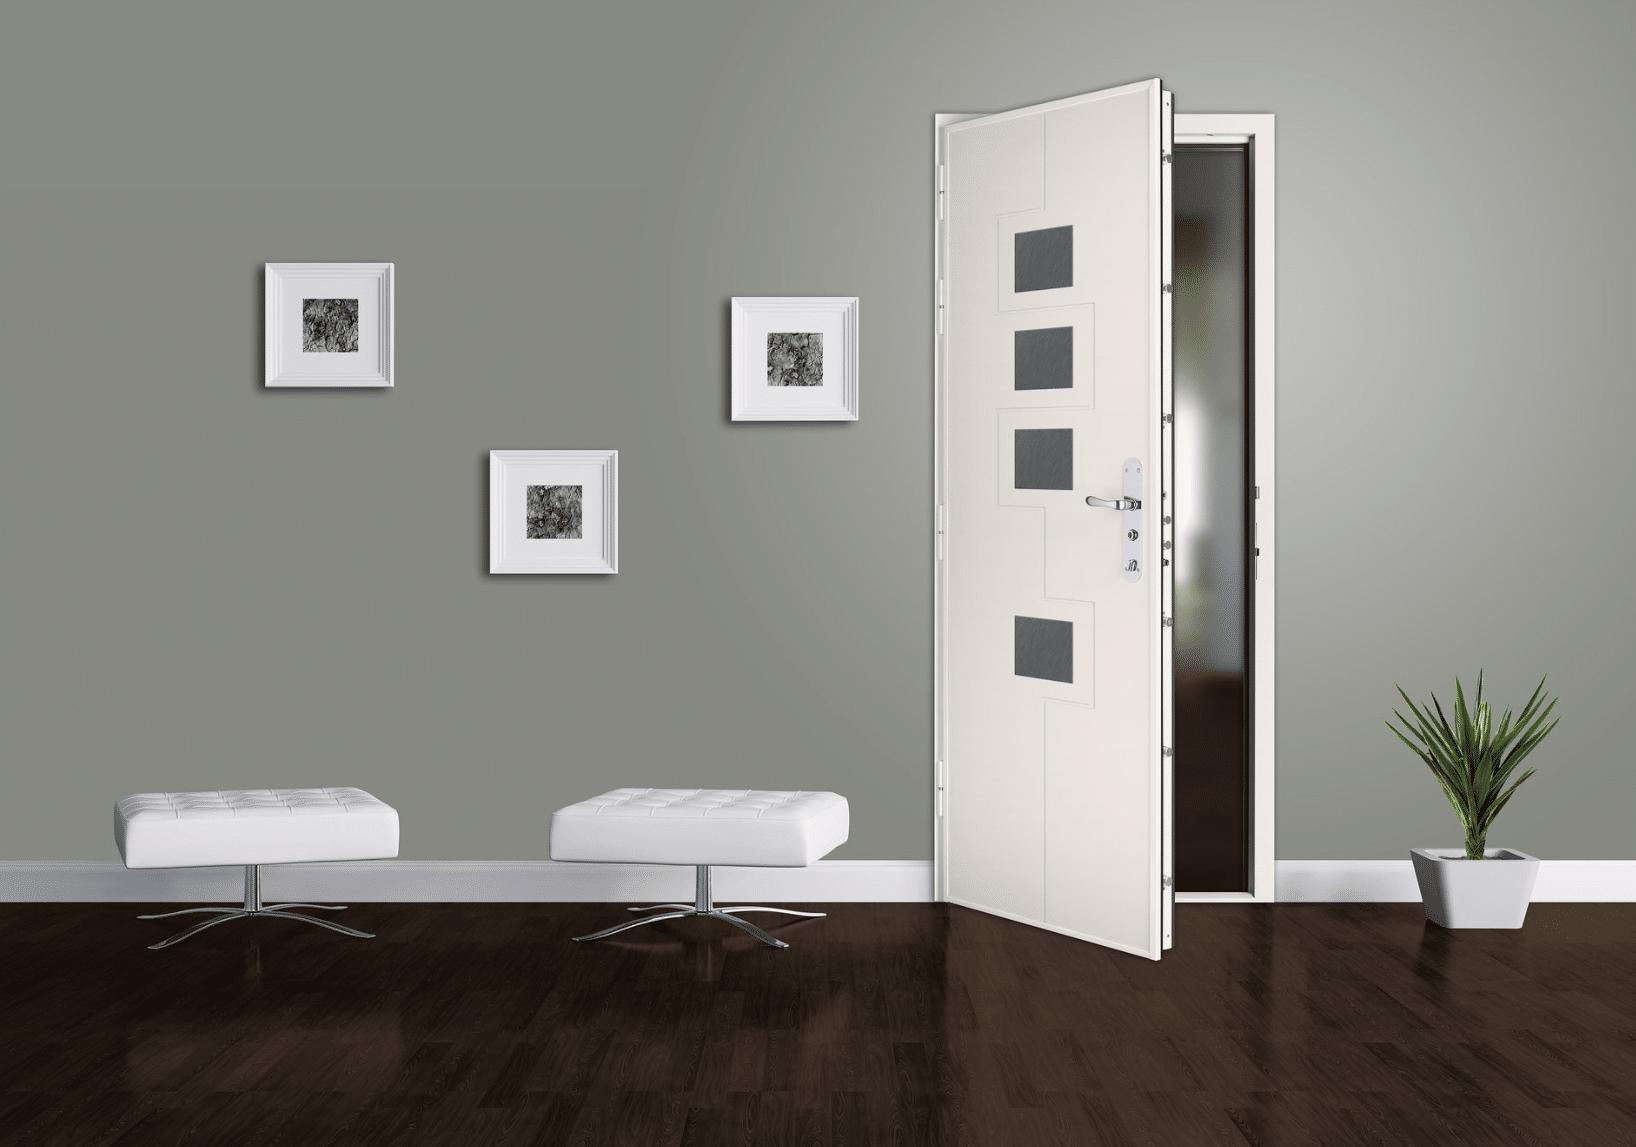 picard serrures lyon porte blindee diamant ei30. Black Bedroom Furniture Sets. Home Design Ideas